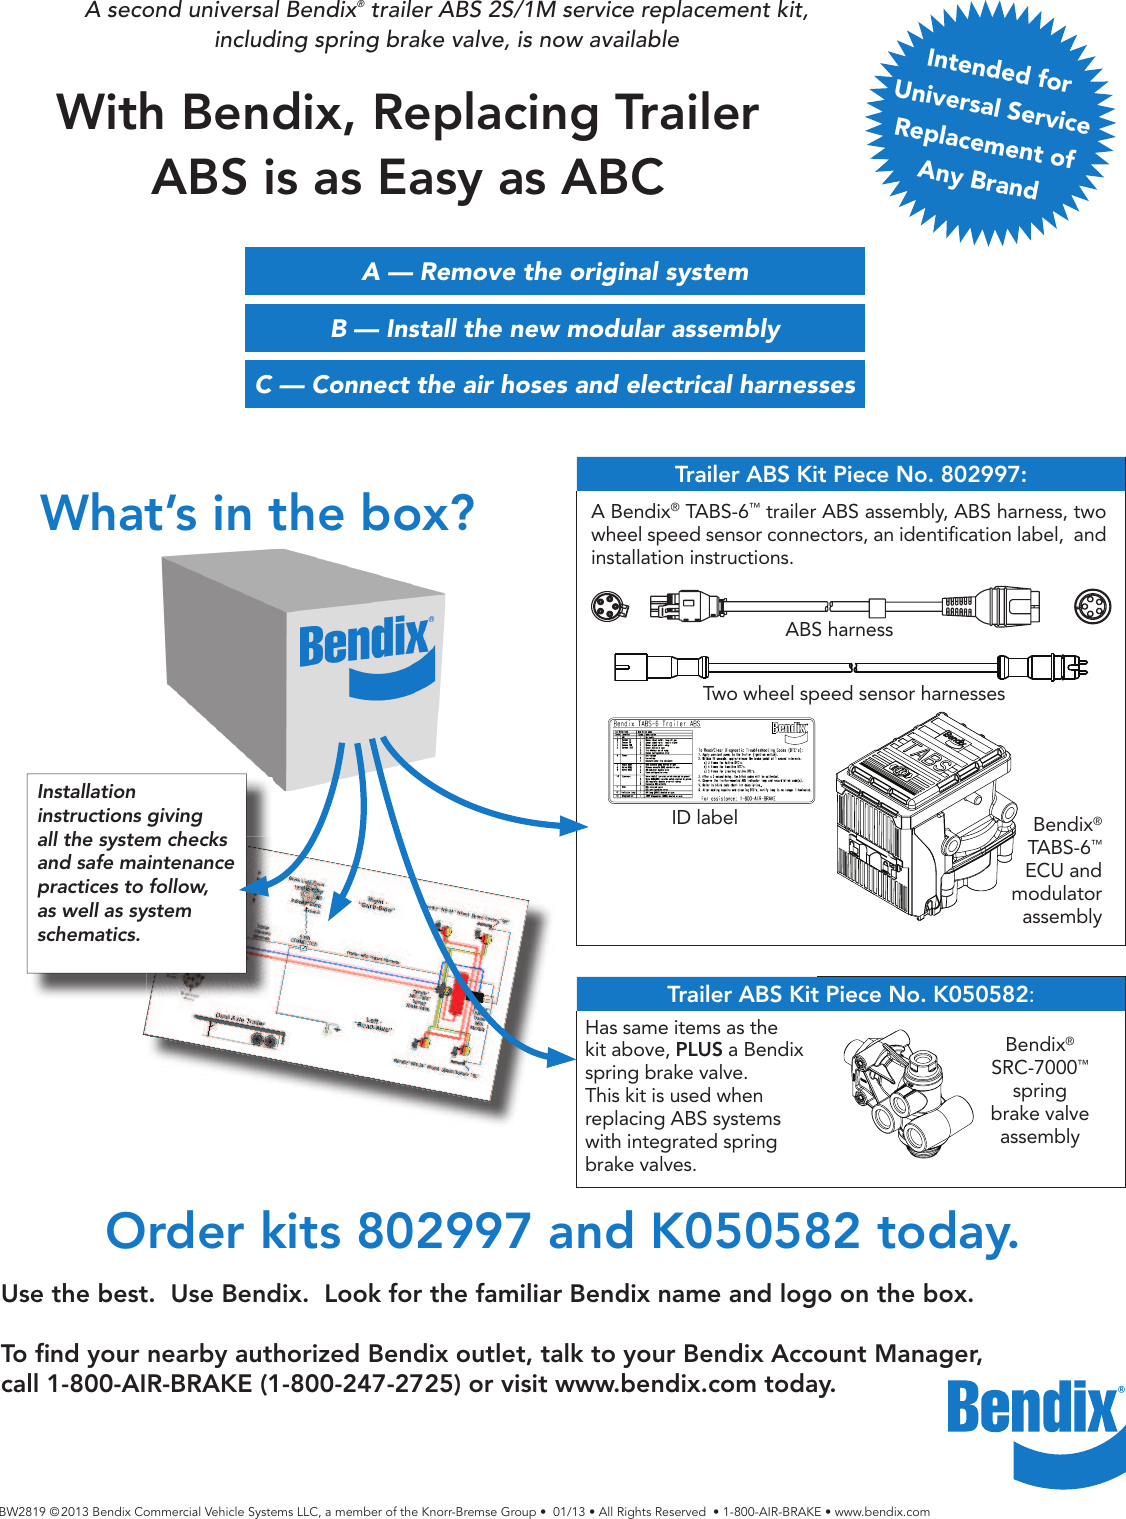 Bendix Modulator Valve Wiring Diagram Schematic Diagrams Trailer Abs Bw2819 Users Manual 002 Us